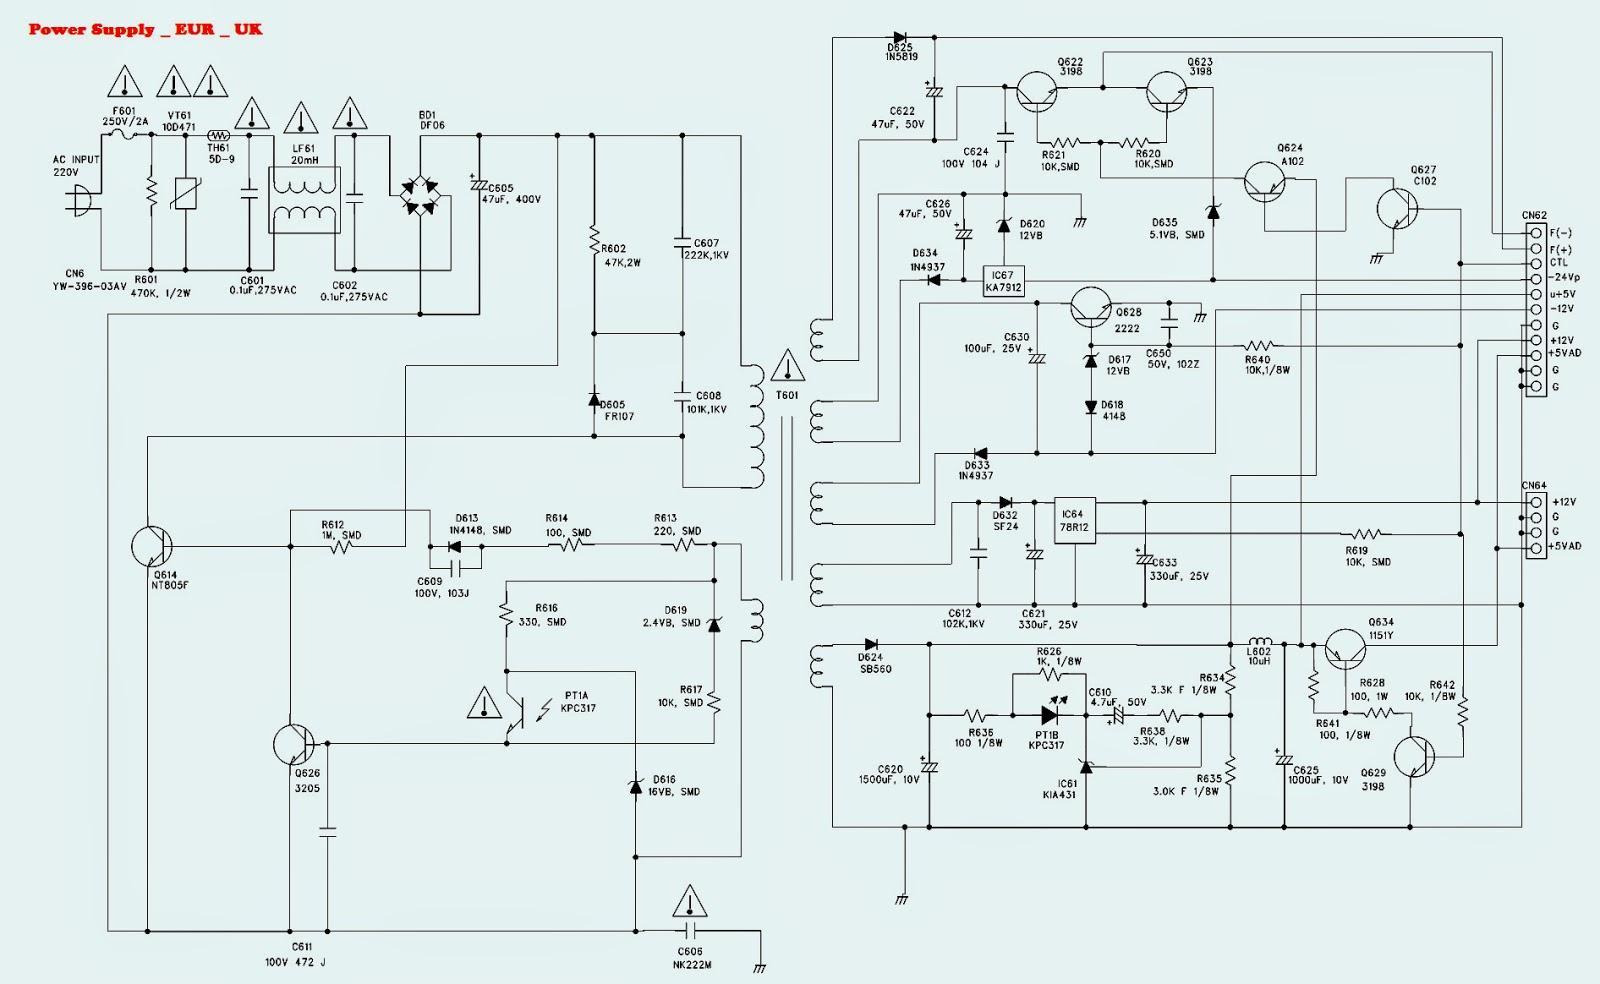 Teac dts dv h550 dv h350 dvd player smps power supply teac dts dv h550 dv h350 dvd player smps power supply circuit diagrams pooptronica